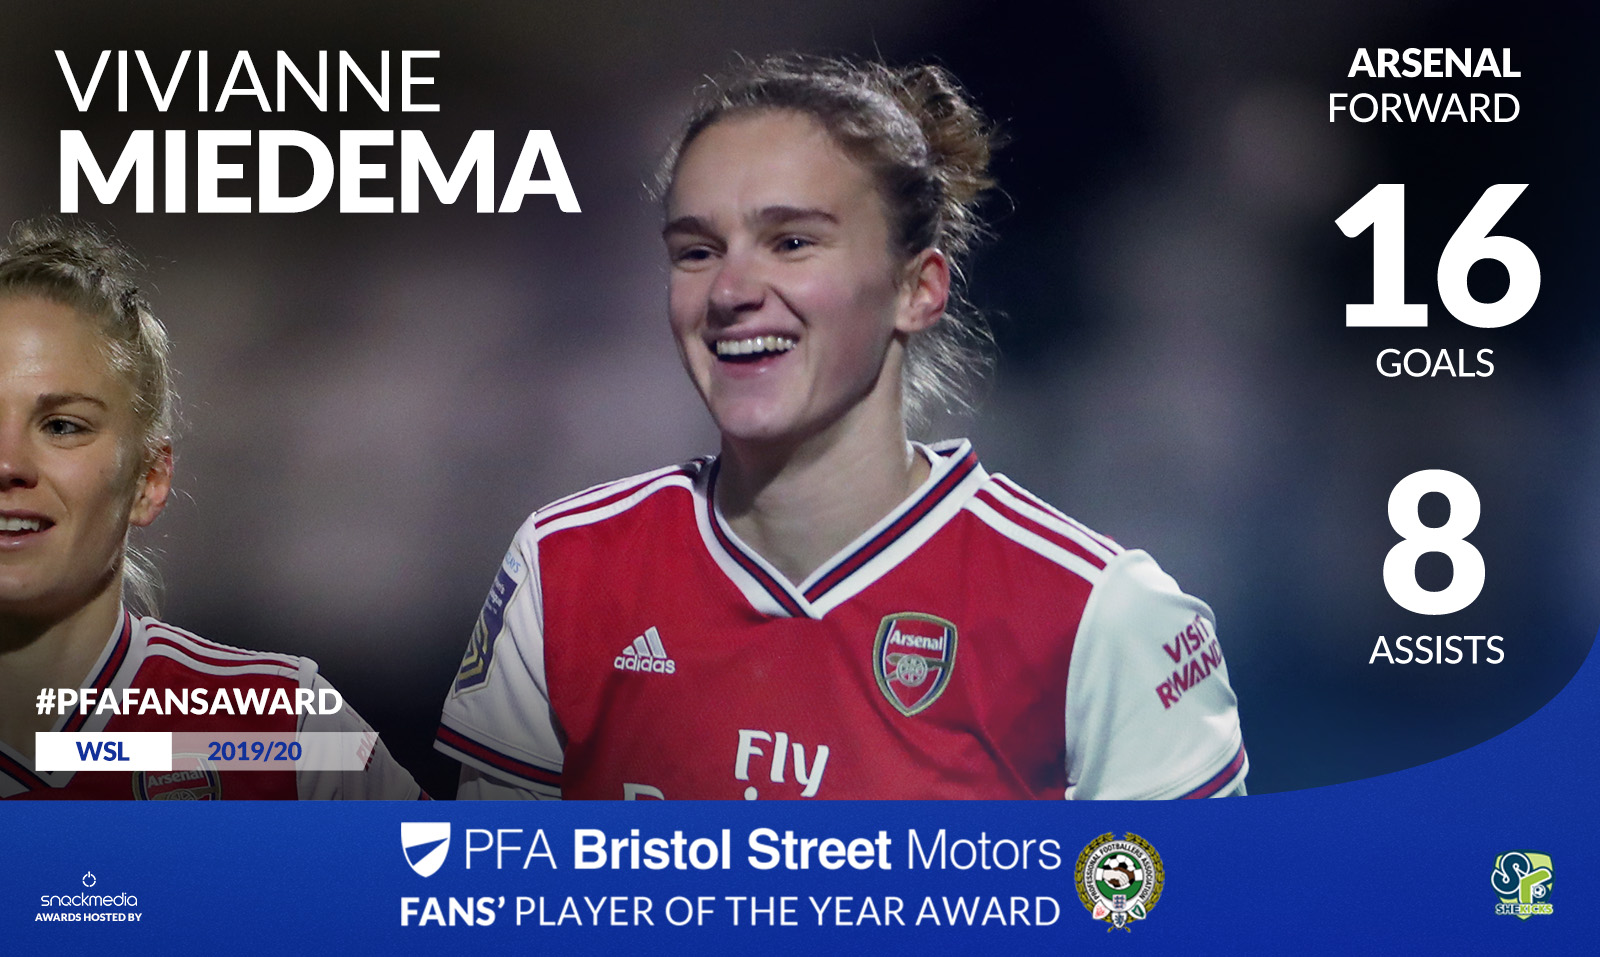 Arsenal's Vivianne Miedema Wins PFA Bristol Street Motors Fans' Player Award